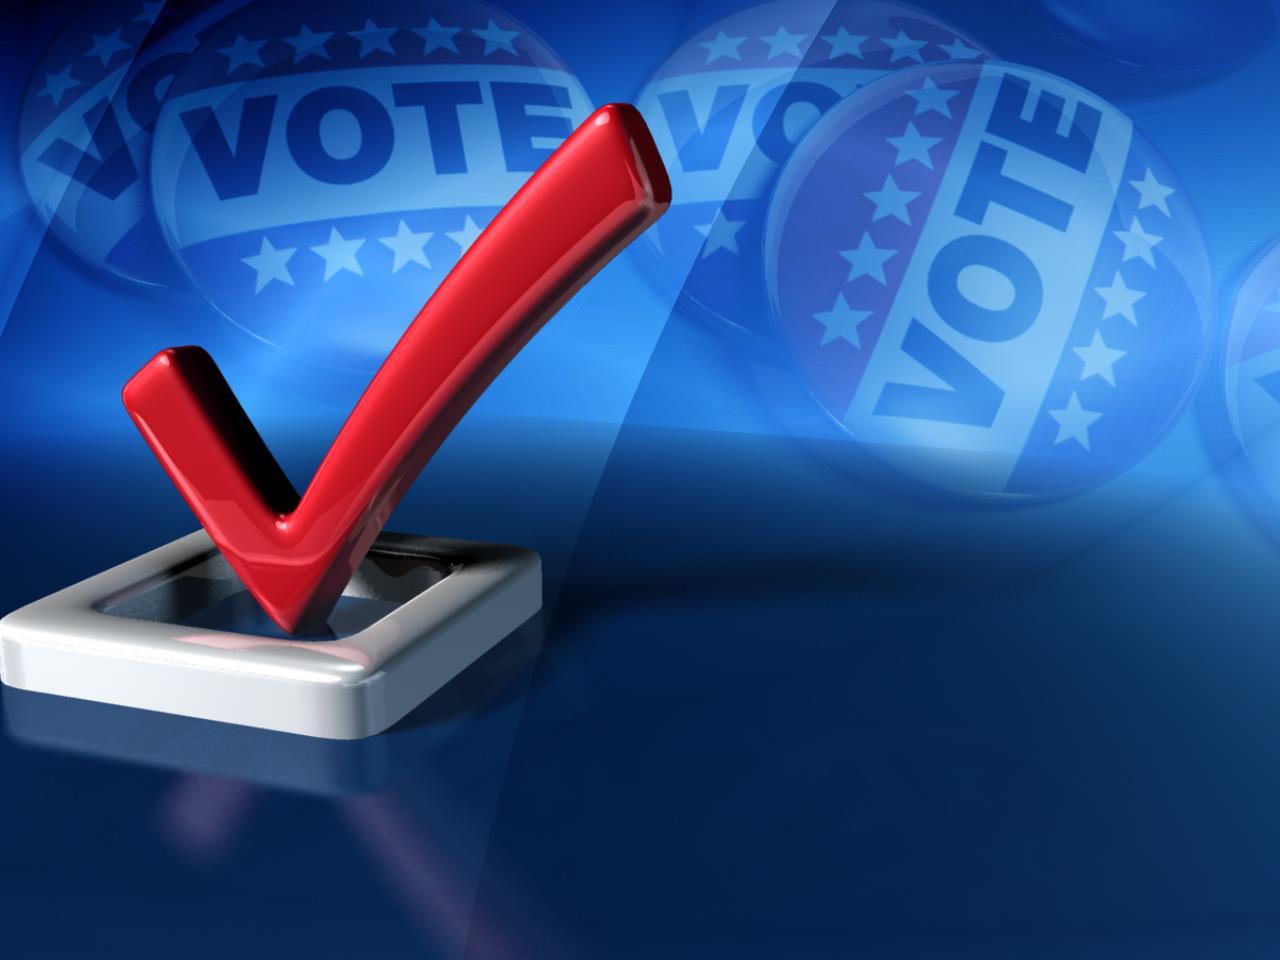 Ballot Box Voting_1518455979467.jpg-118809306.jpg